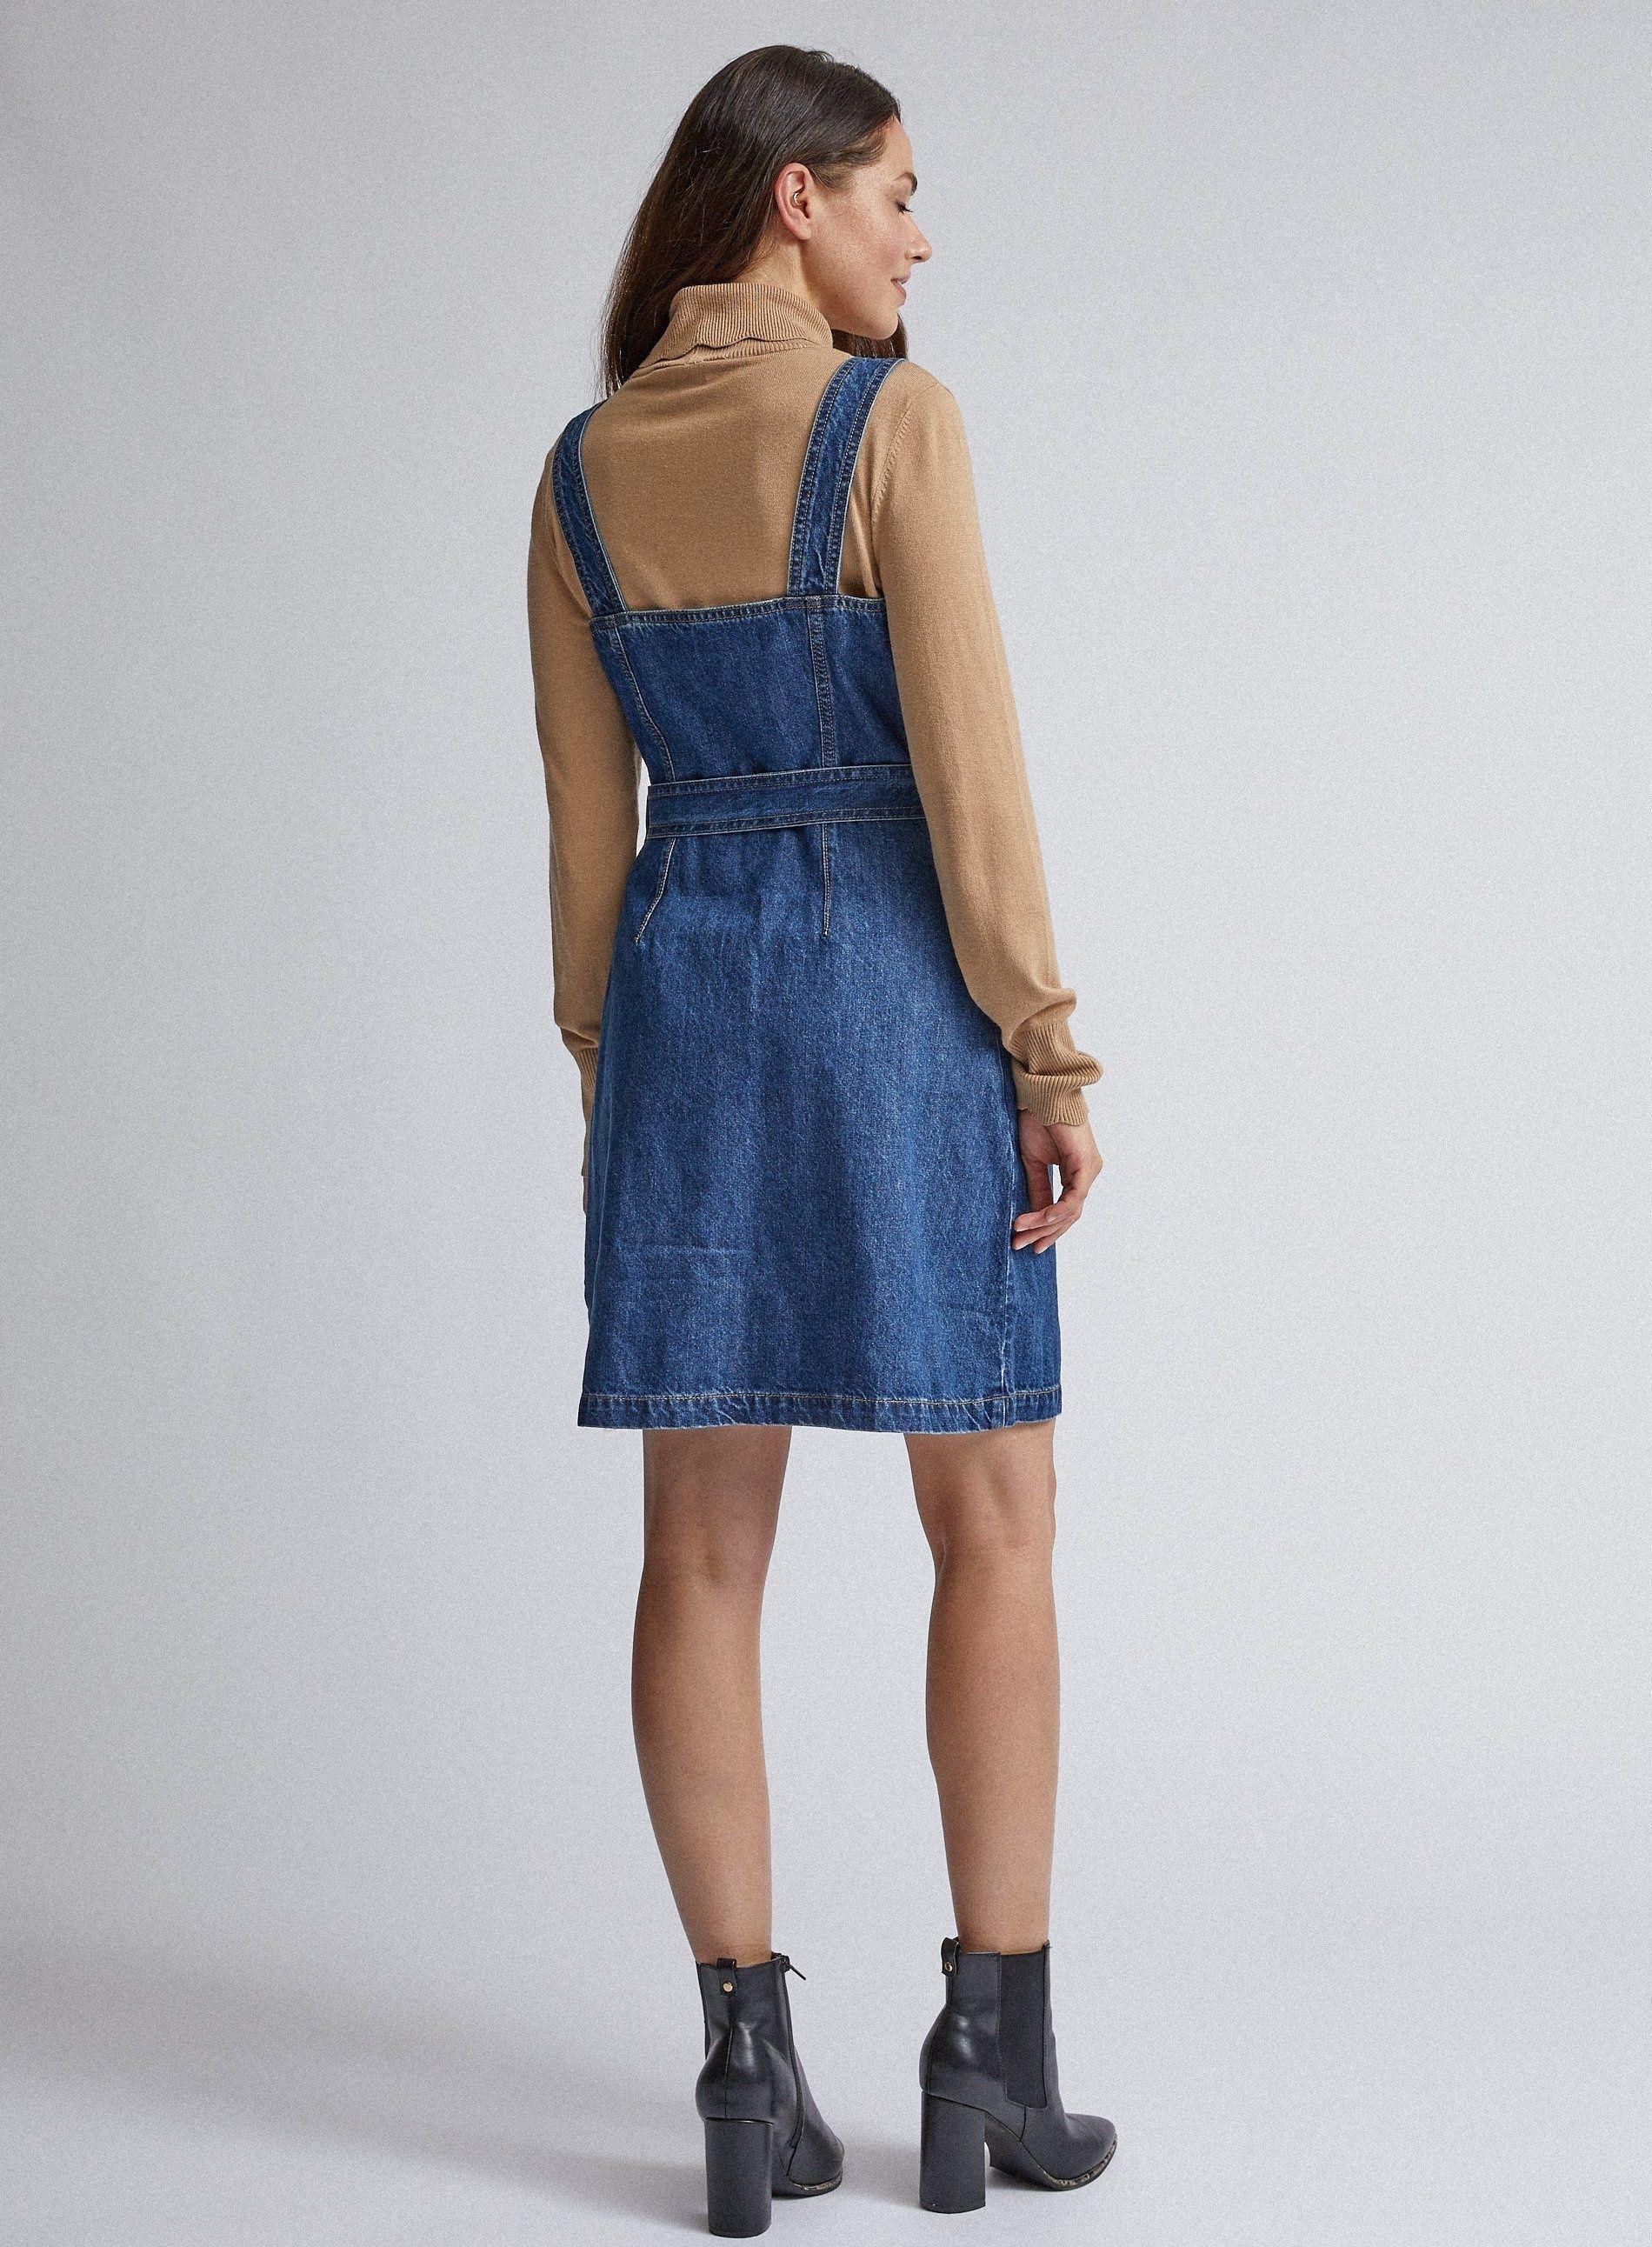 Dorothy Perkins Womens Blue Belted Pinafore Mini Dress Sleeveless Belt Detailing